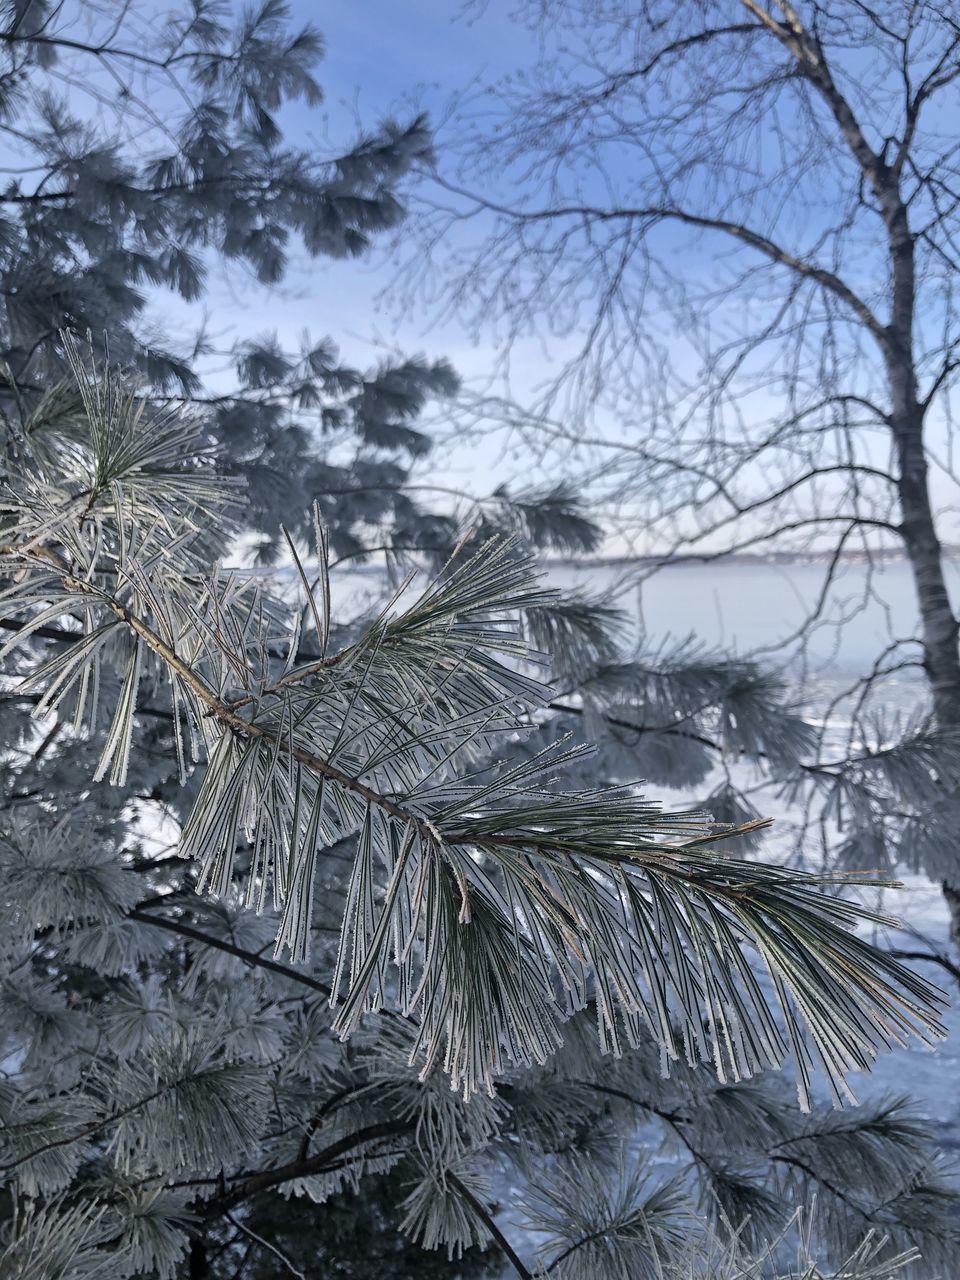 CLOSE-UP OF FROZEN PLANTS AGAINST SKY